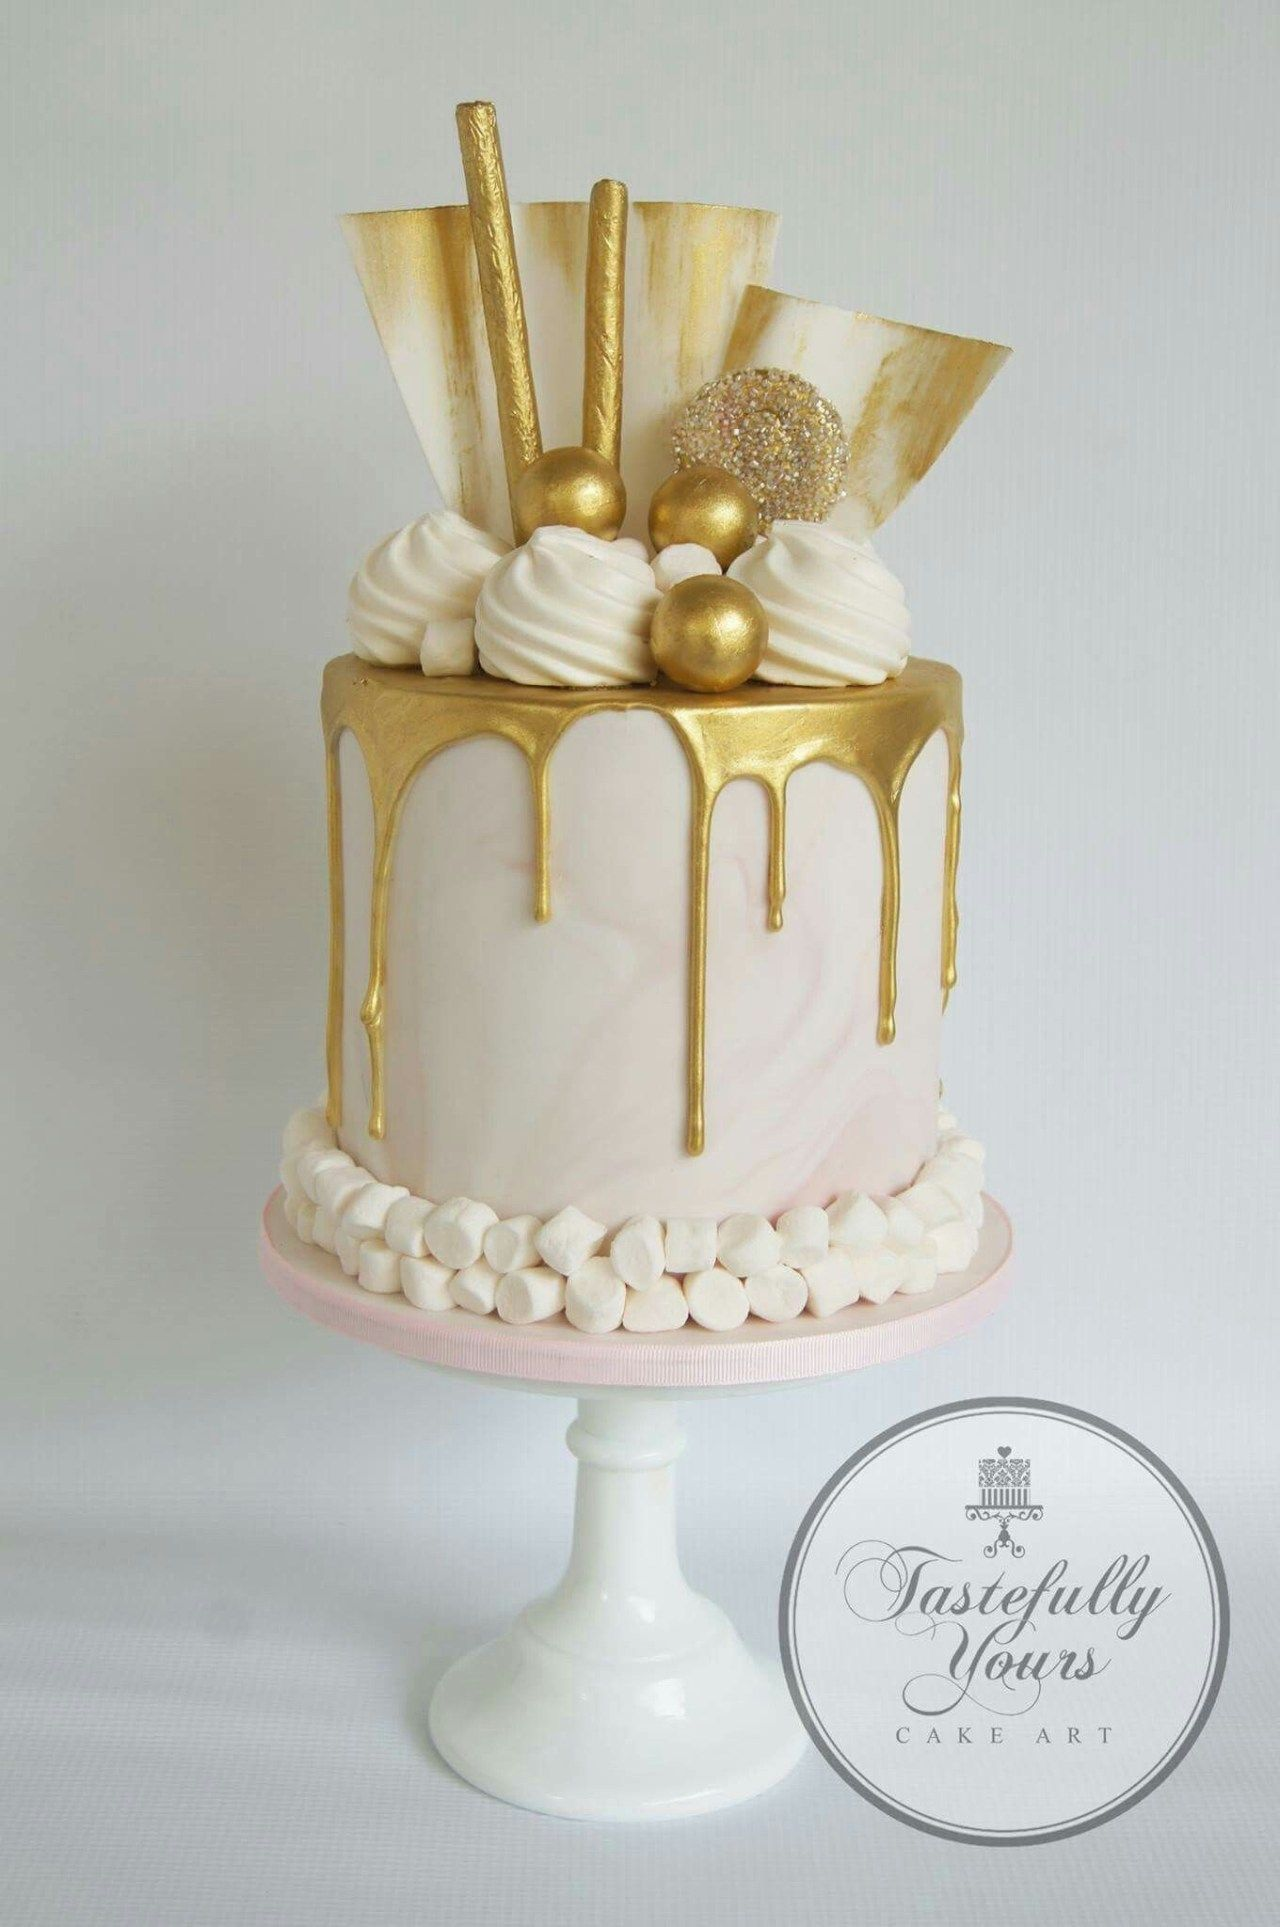 Superb Elegant Birthday Cakes Pin Michelle Juranko On Cakes Pinterest Personalised Birthday Cards Bromeletsinfo